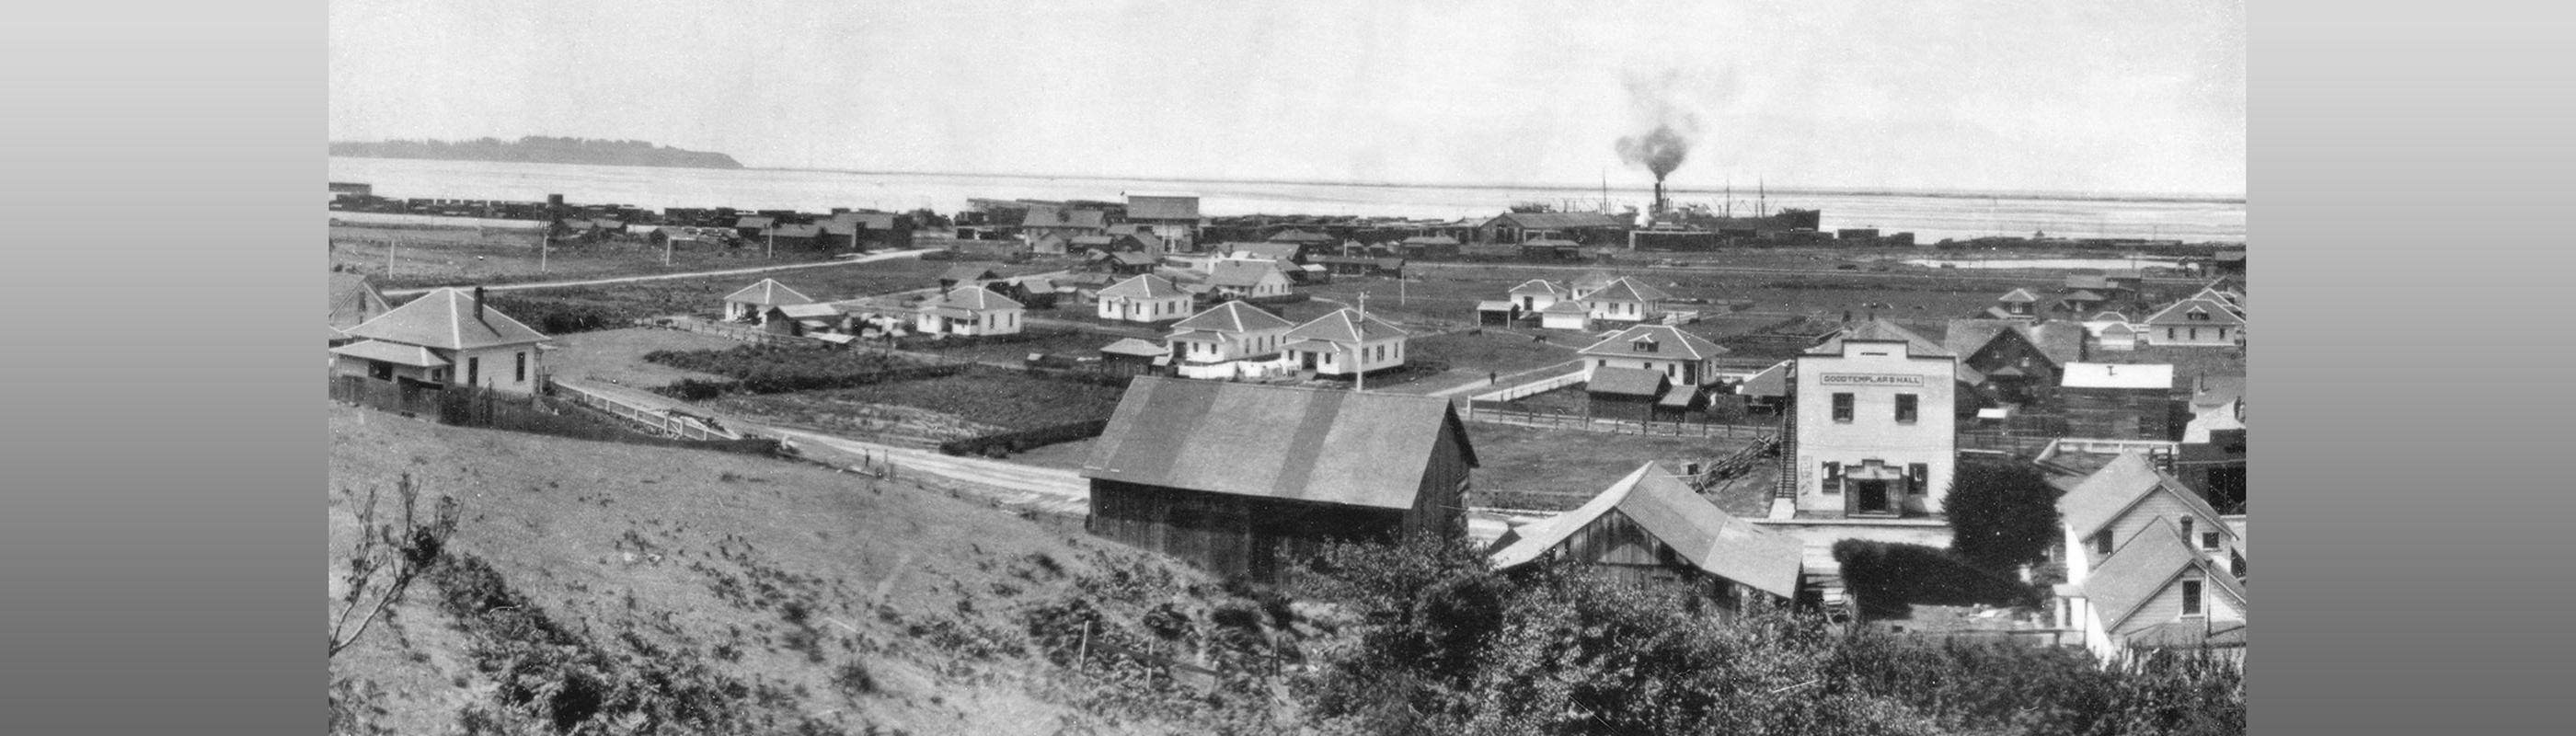 Historic photo of Fields Landing